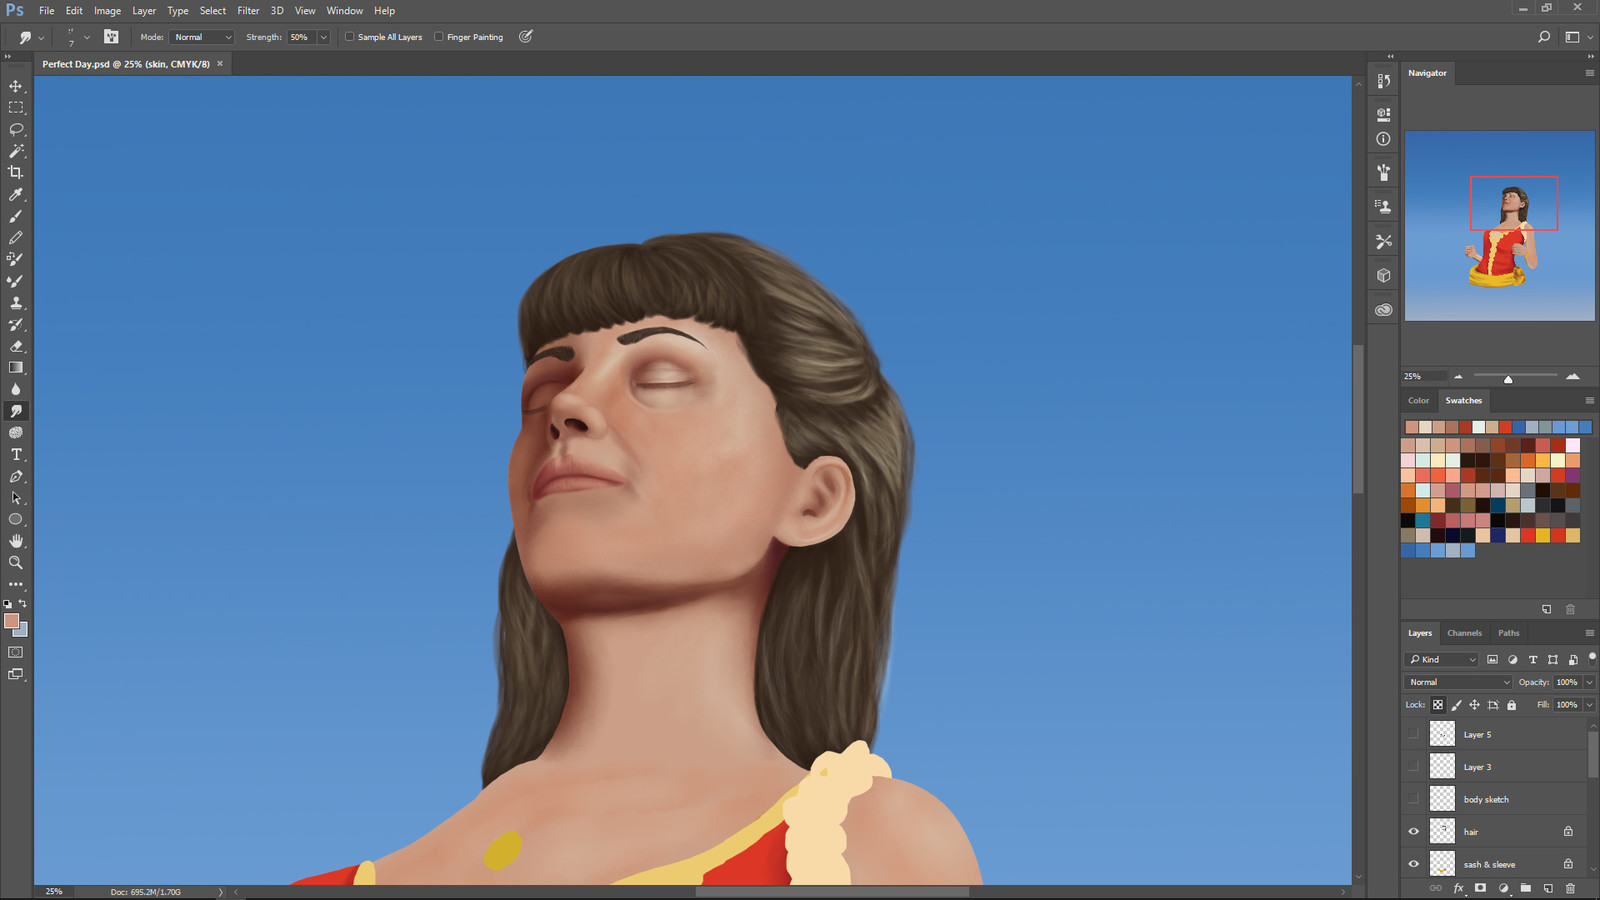 Third in progress screenshot.